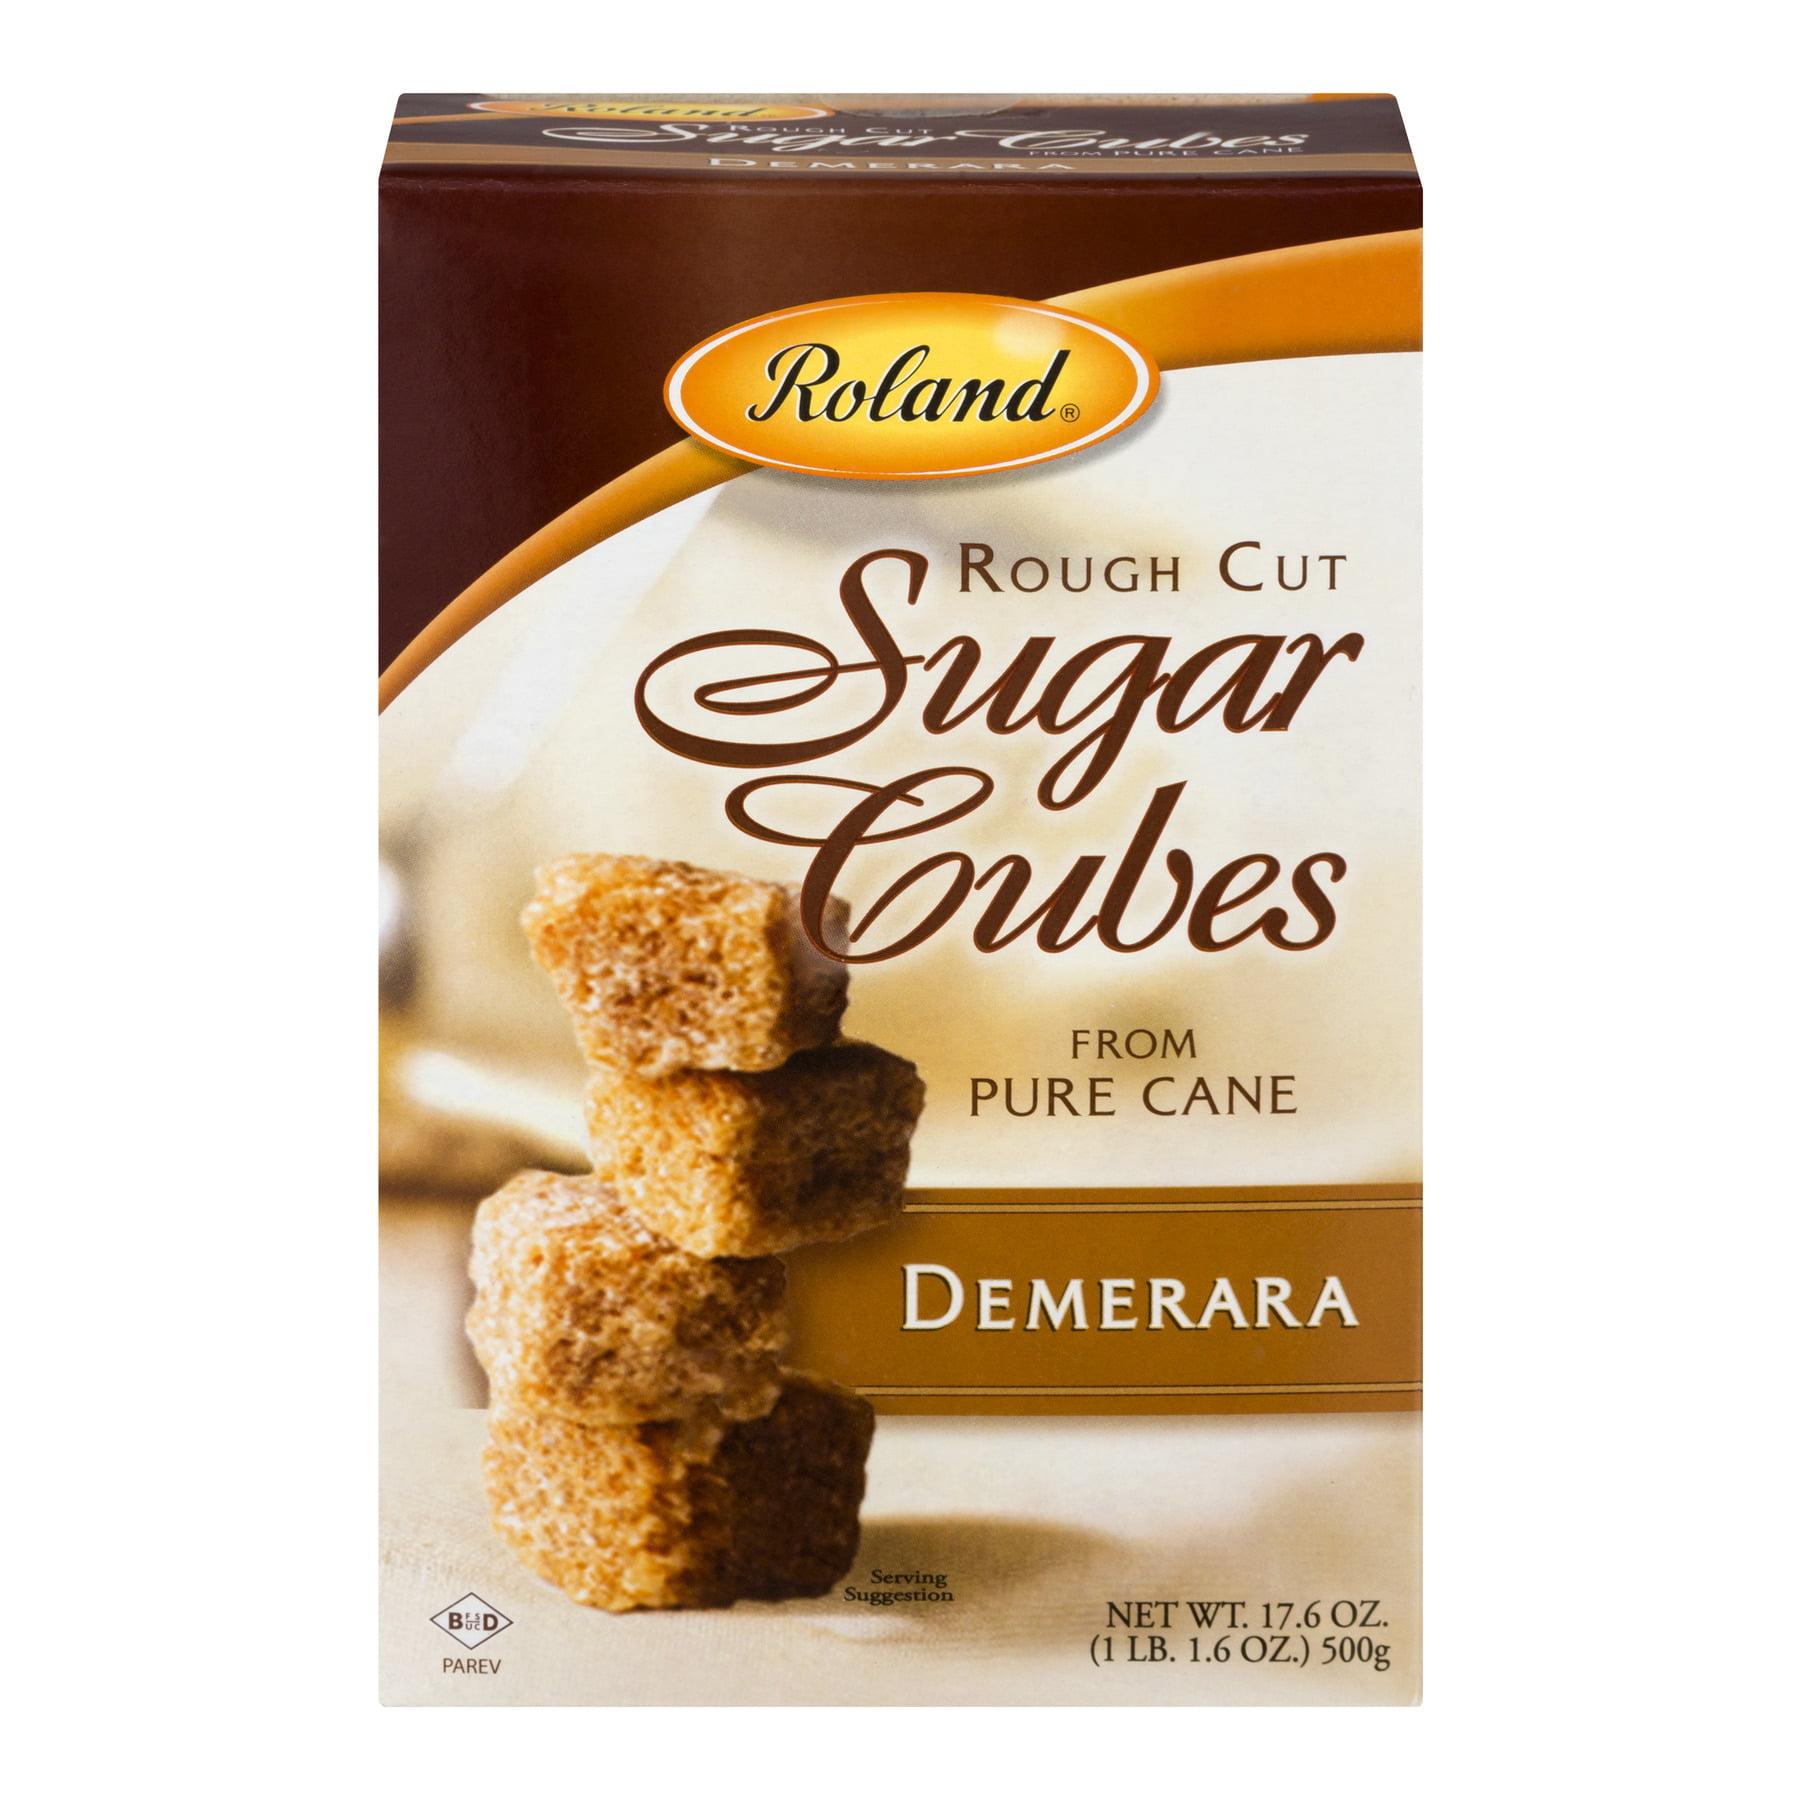 Roland Rough Cut Sugar Cubes Demerara, 17.6 OZ